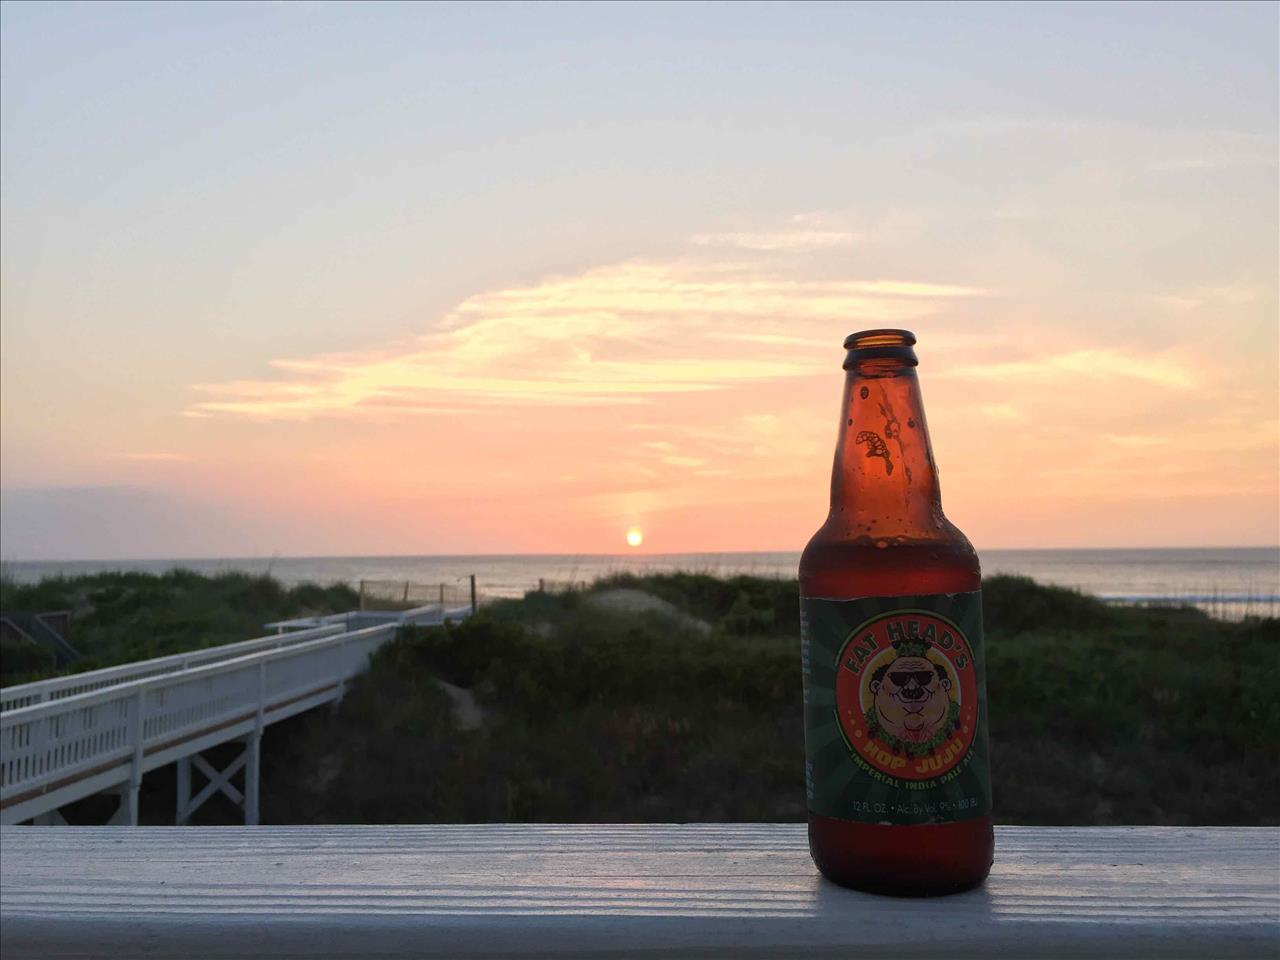 June 2015 Stay - DE02 - Beach Boys, Brian Adametz